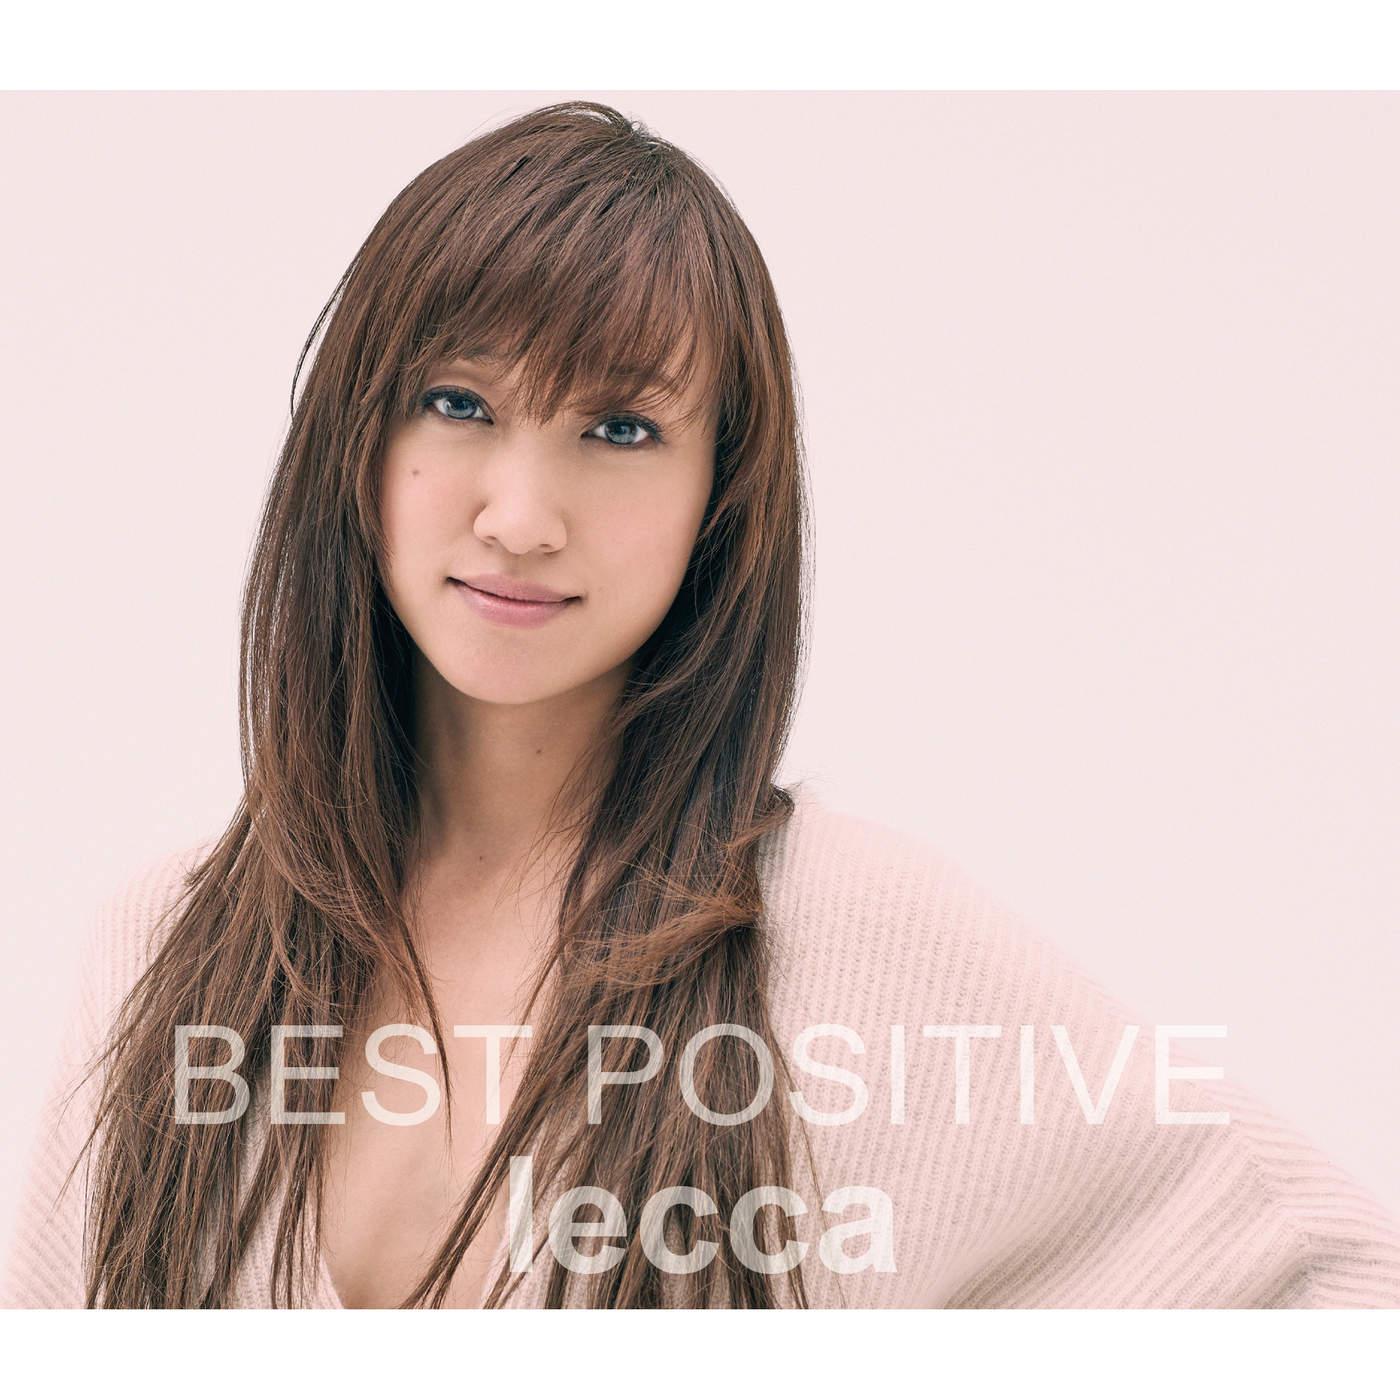 [Single] lecca – ねがい (2016.01.13 /MP3/RAR)